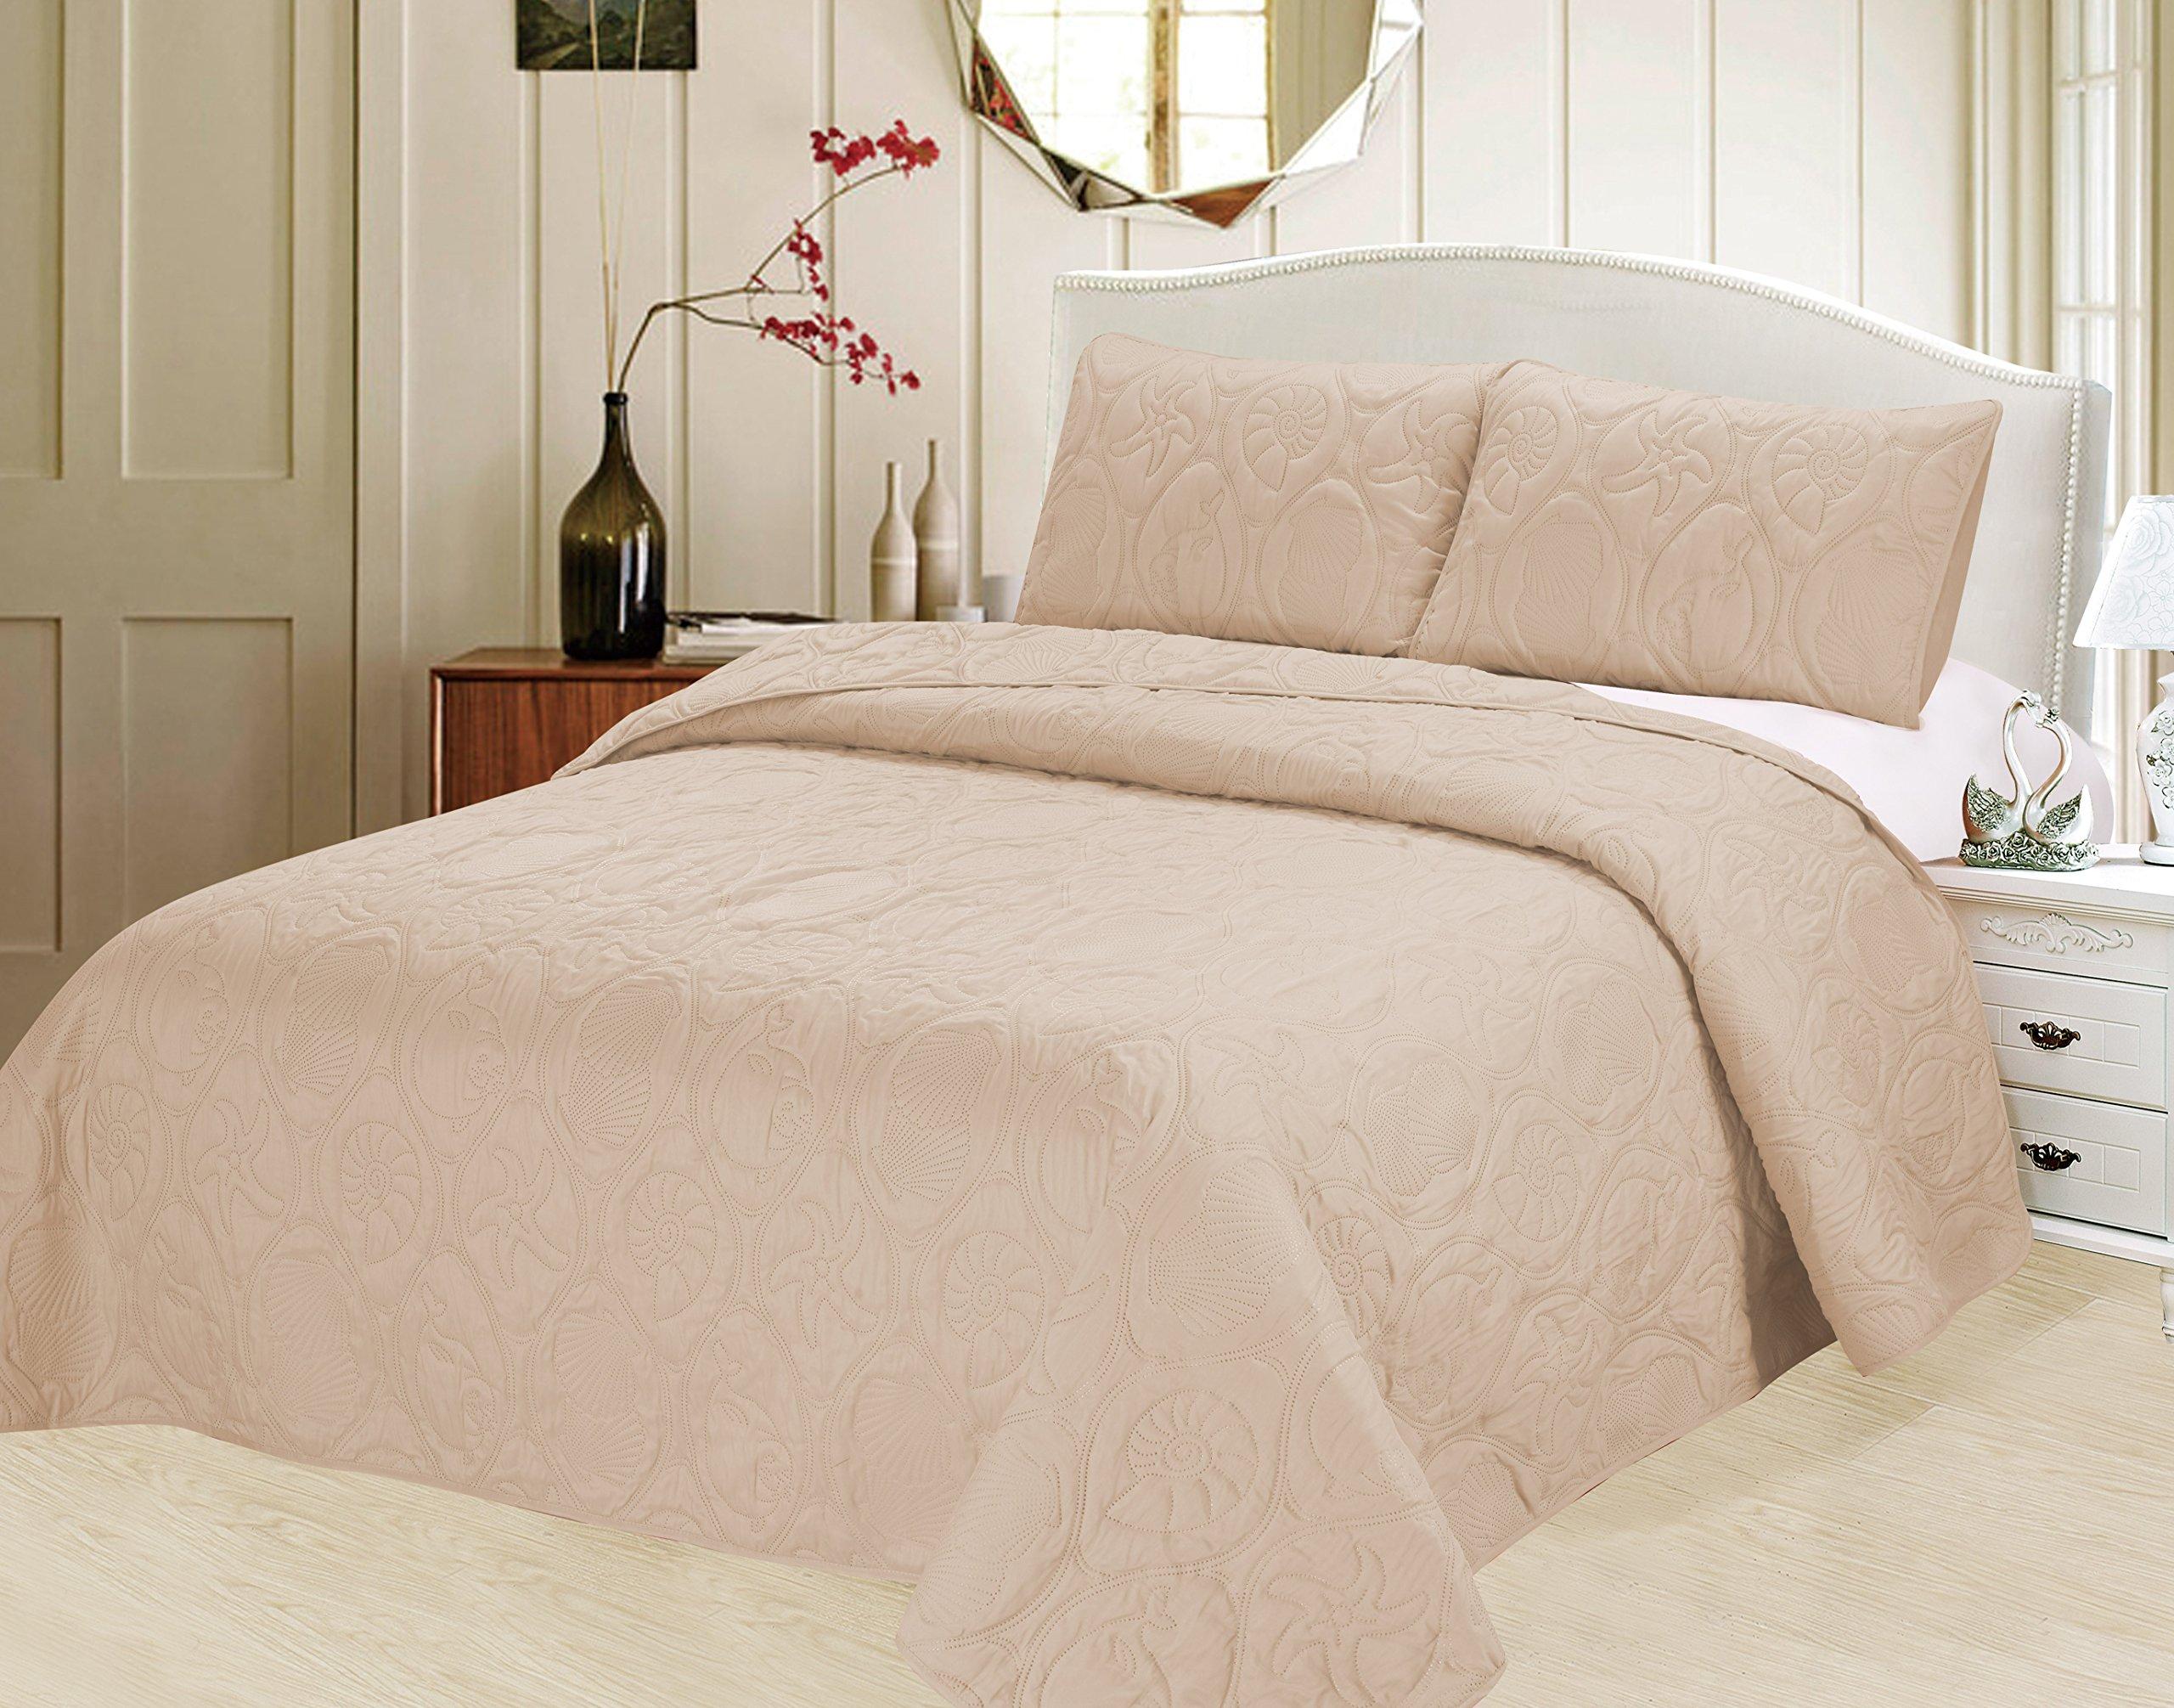 Verno Ocean Star Oversized Bedspread Set with Shams (Ivory, Full)